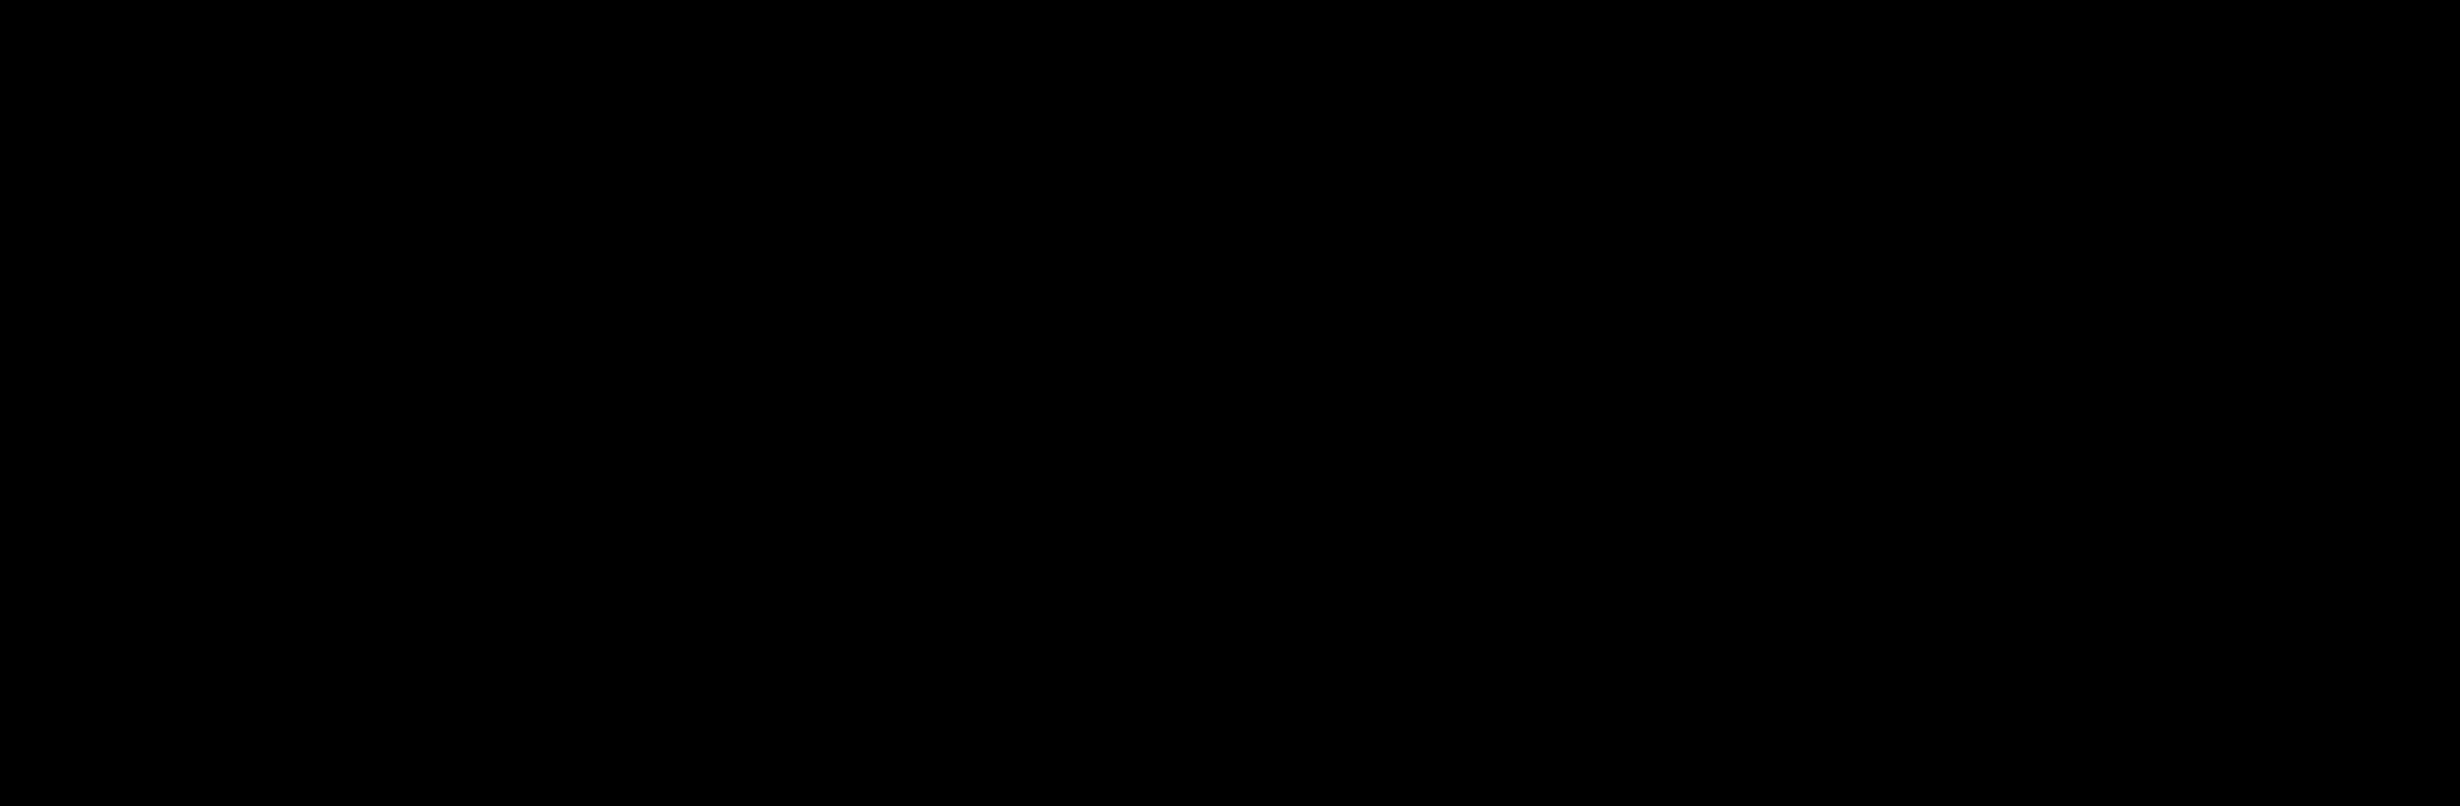 Silodosin-d<sub>6</sub>